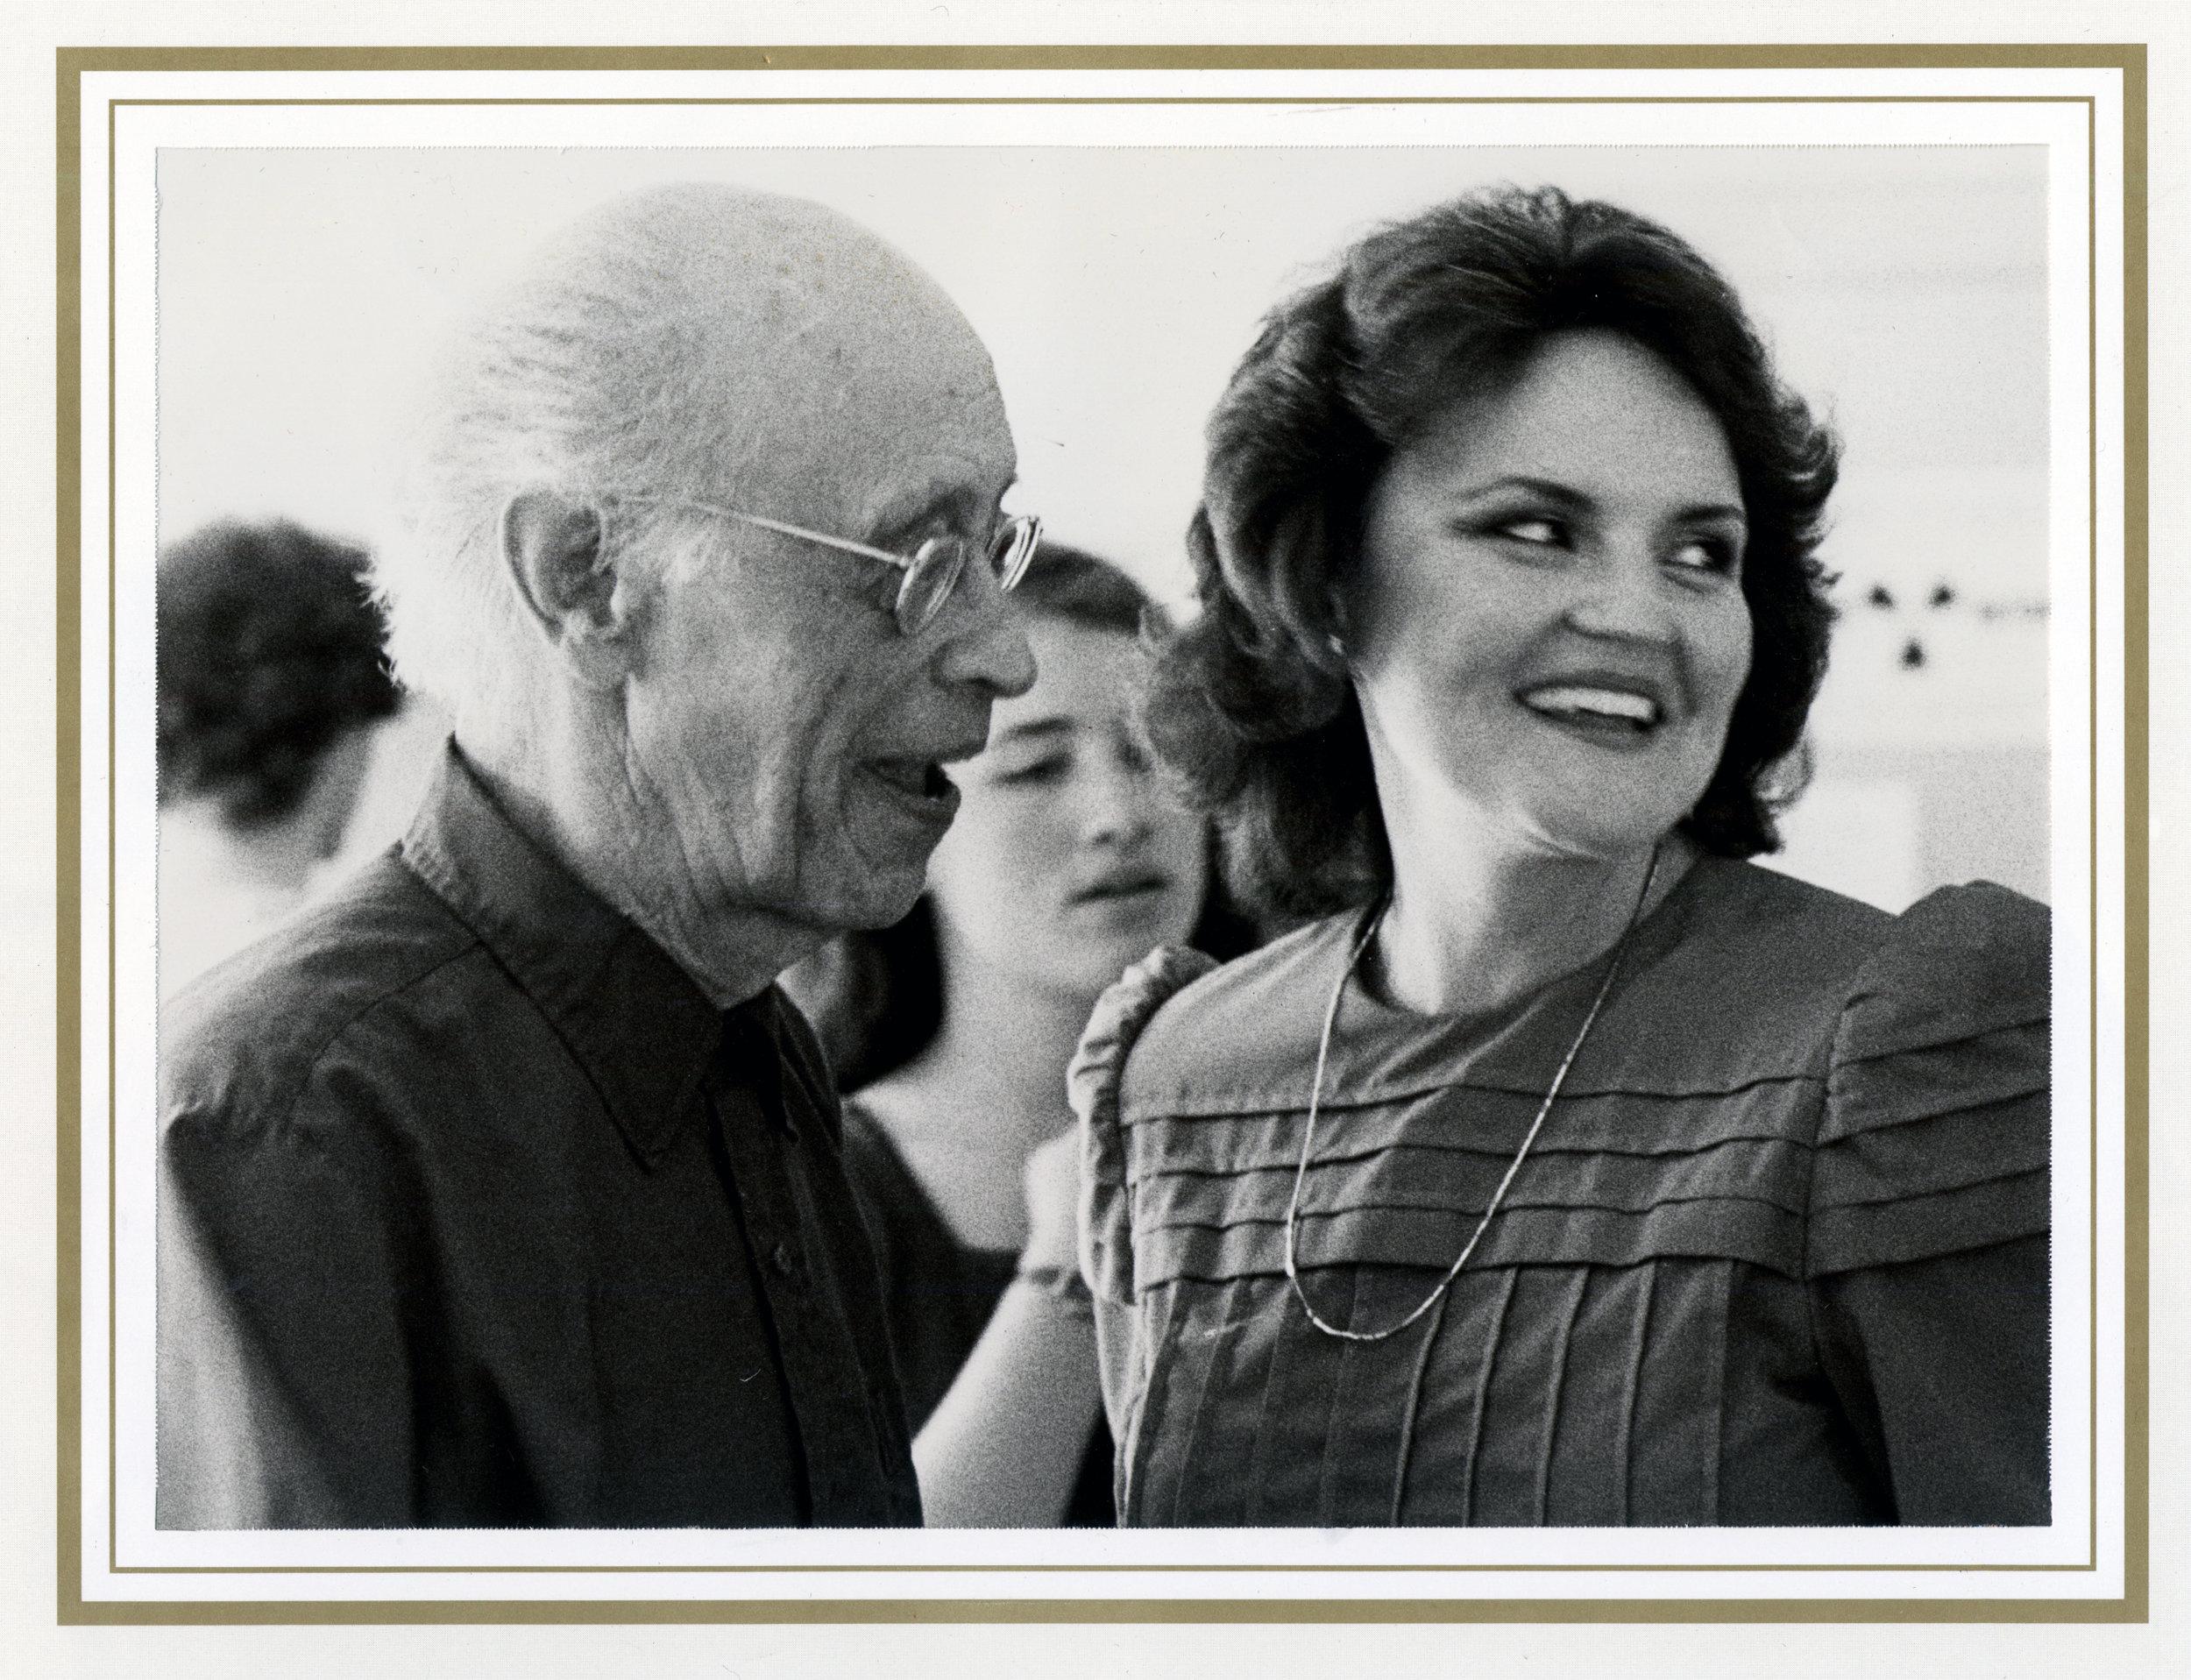 with Rudolf Serkin at Marlboro Chamber Music Festival